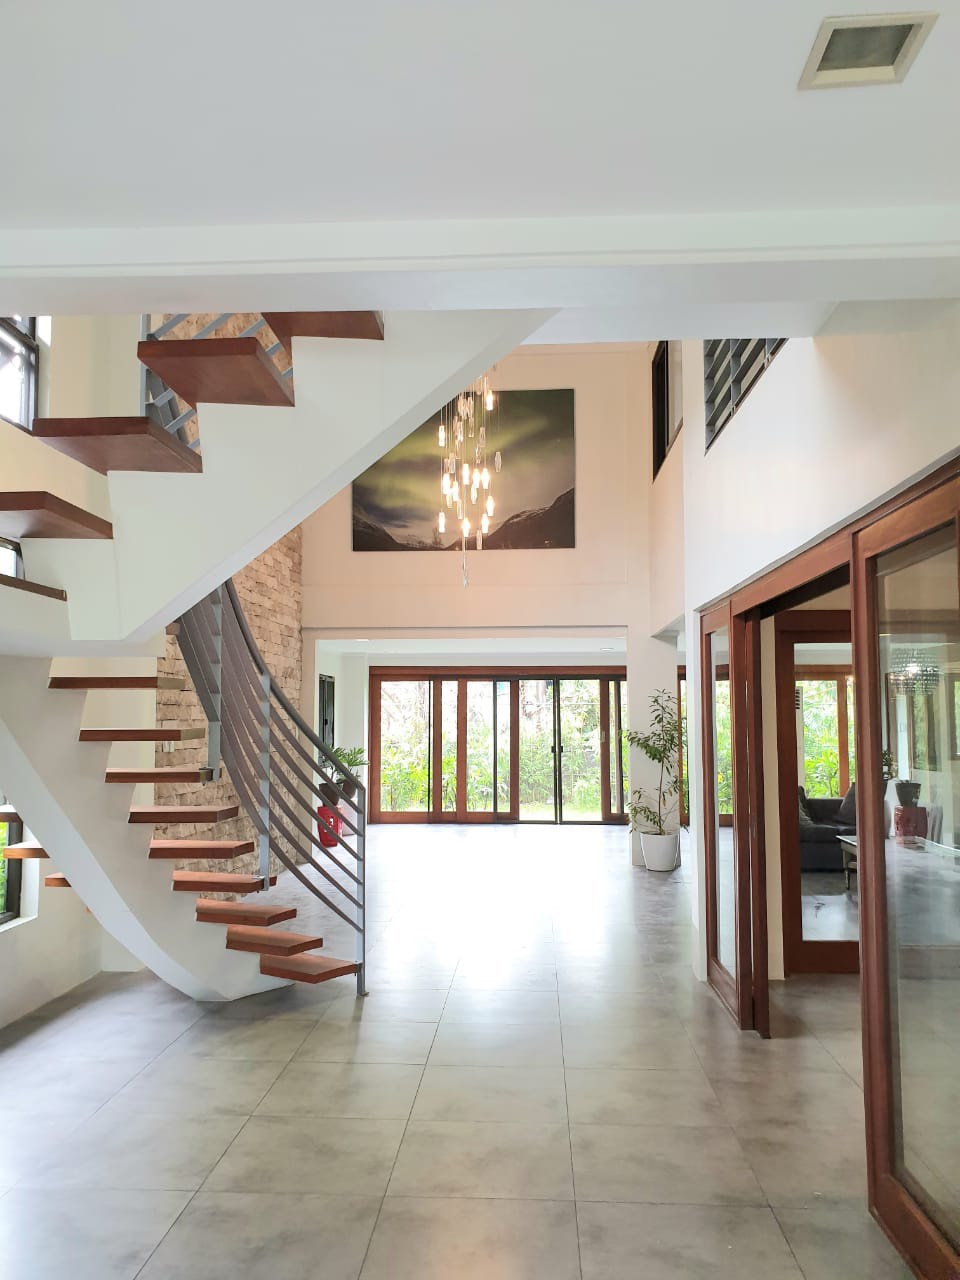 4 Bedrooms House For Sale, Ayala Alabang 5